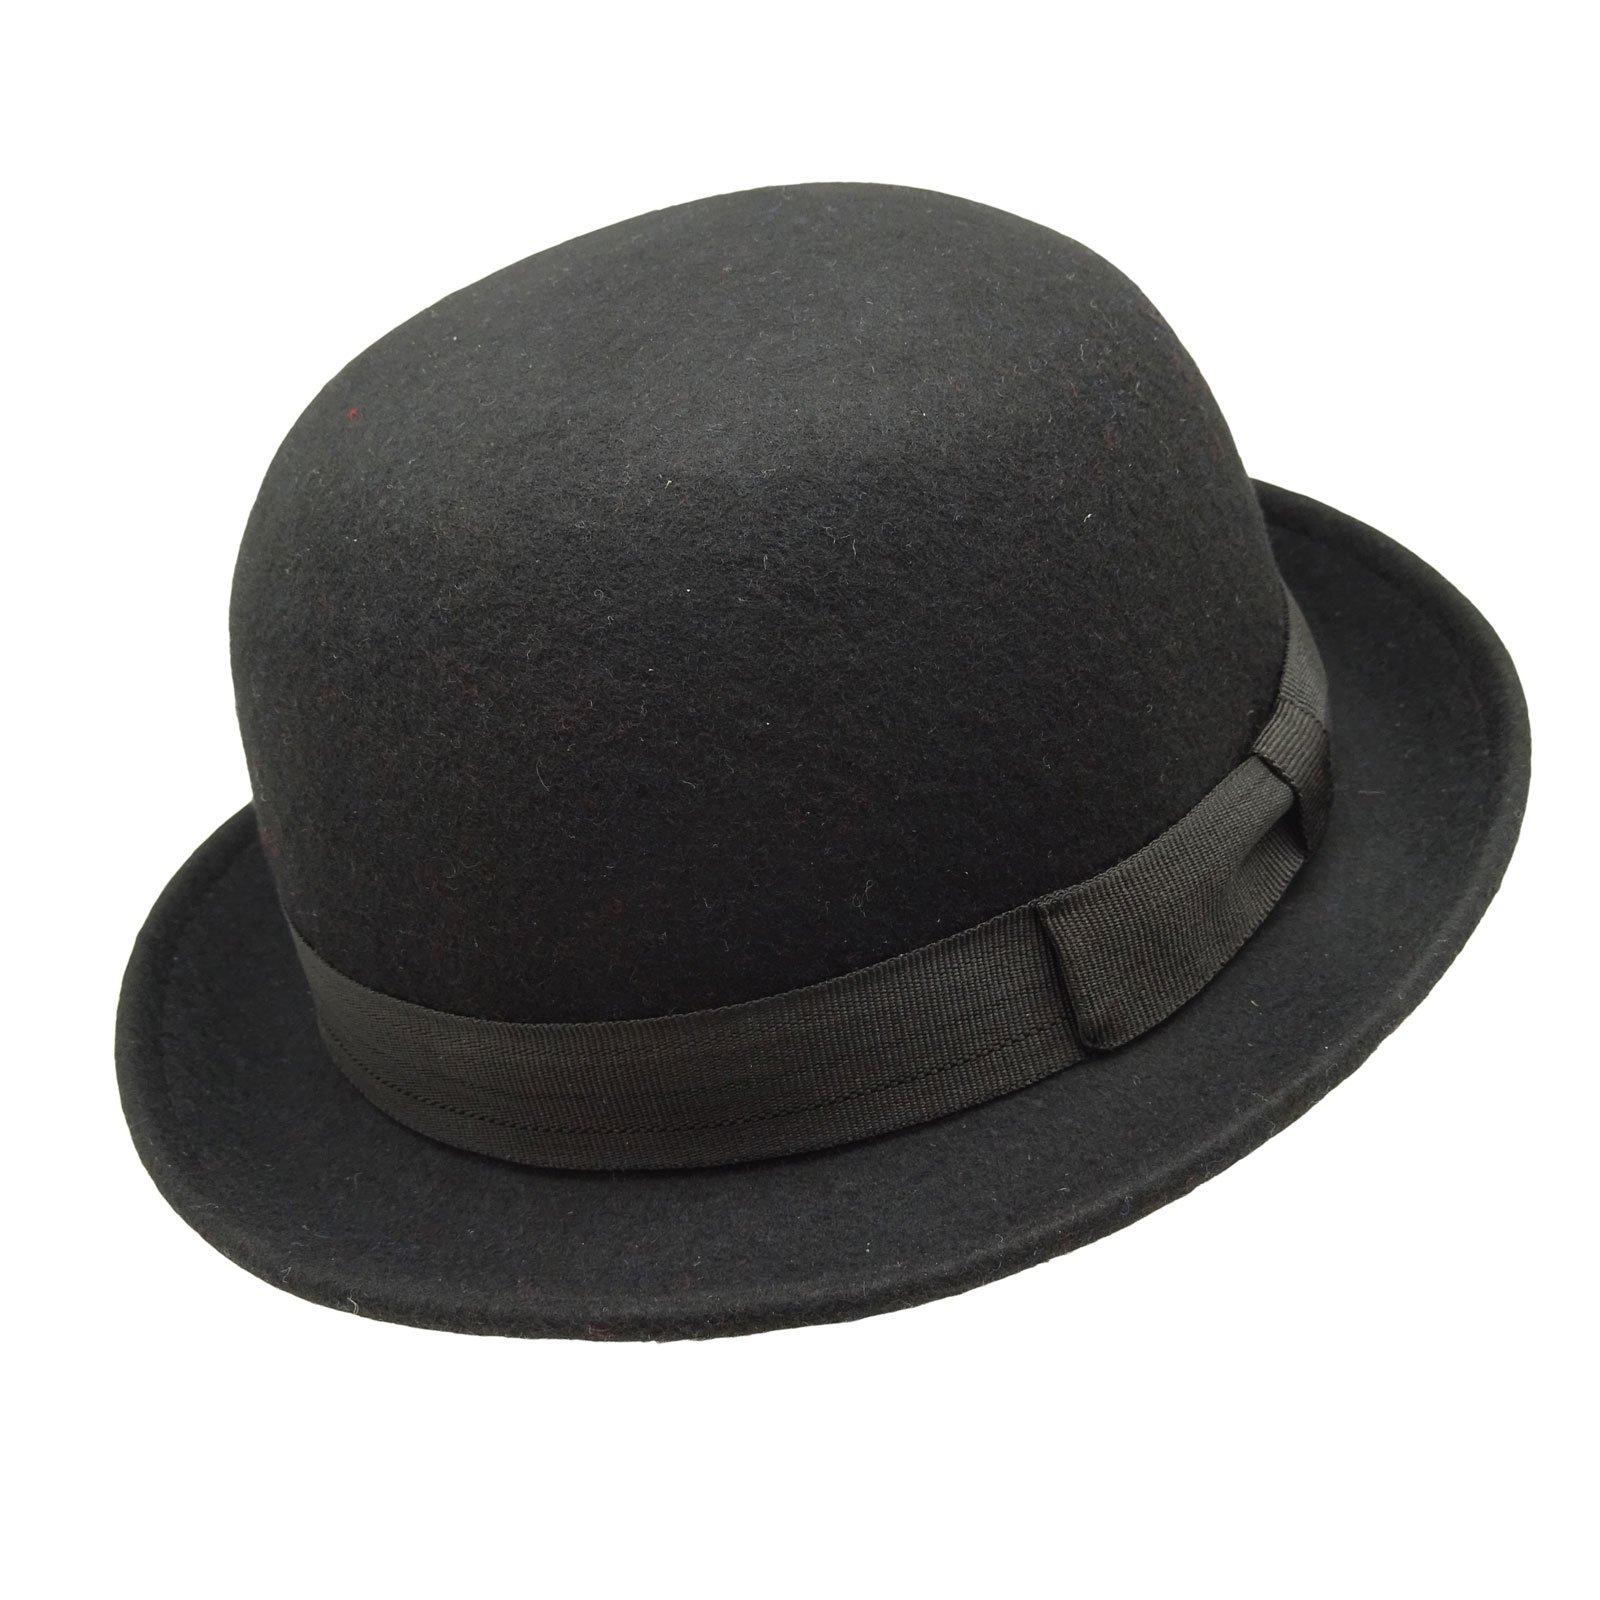 HATsanity Kid's Fashion Wool Felt Soft Bowler Hat Black